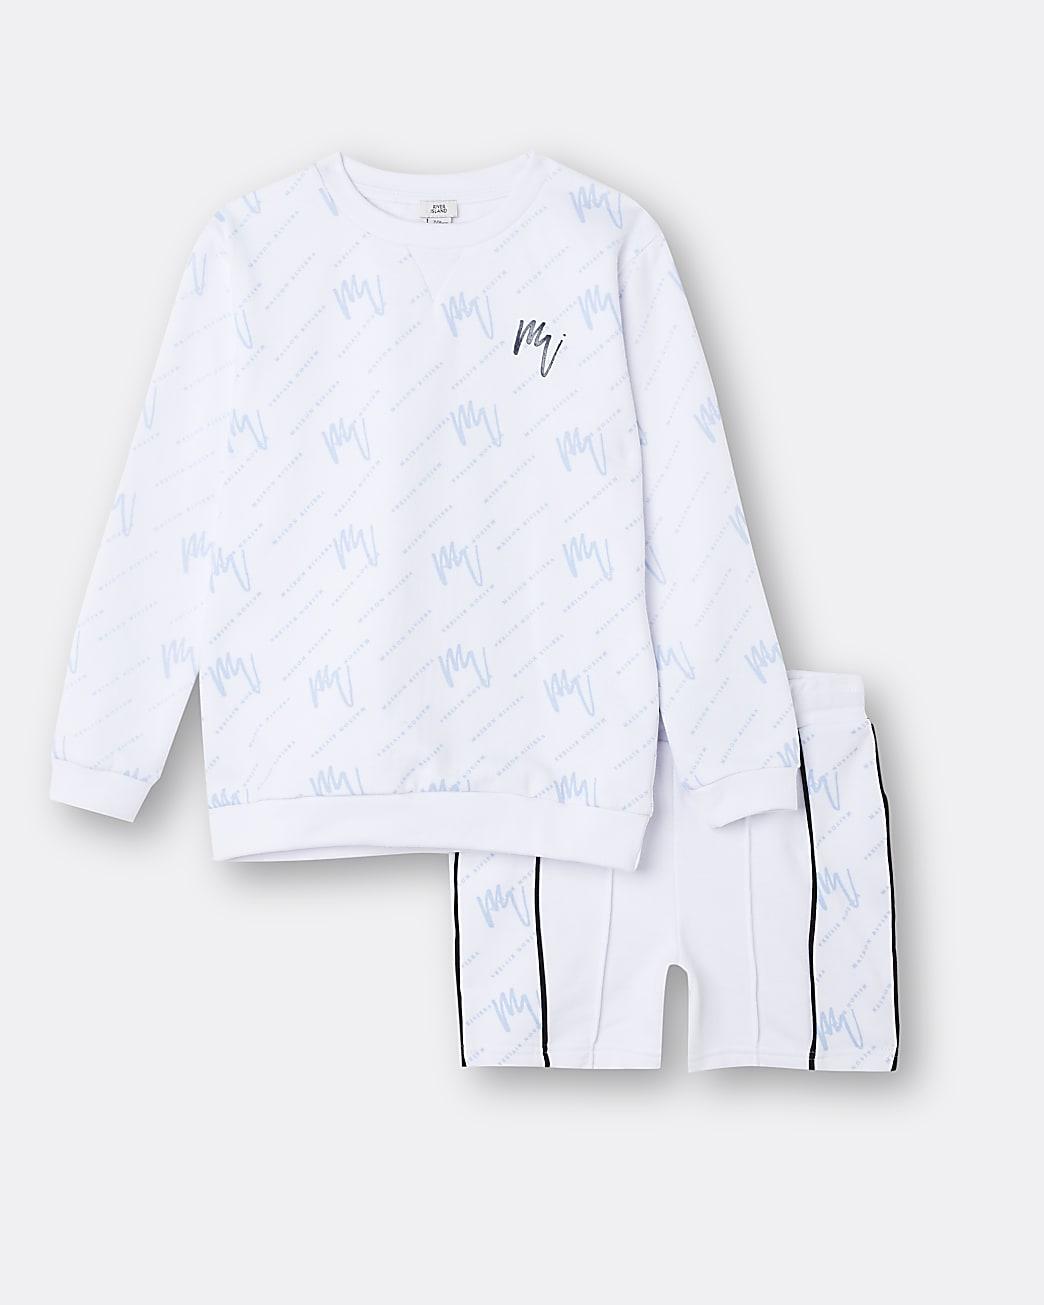 Boys white Maison Riviera top and shorts set